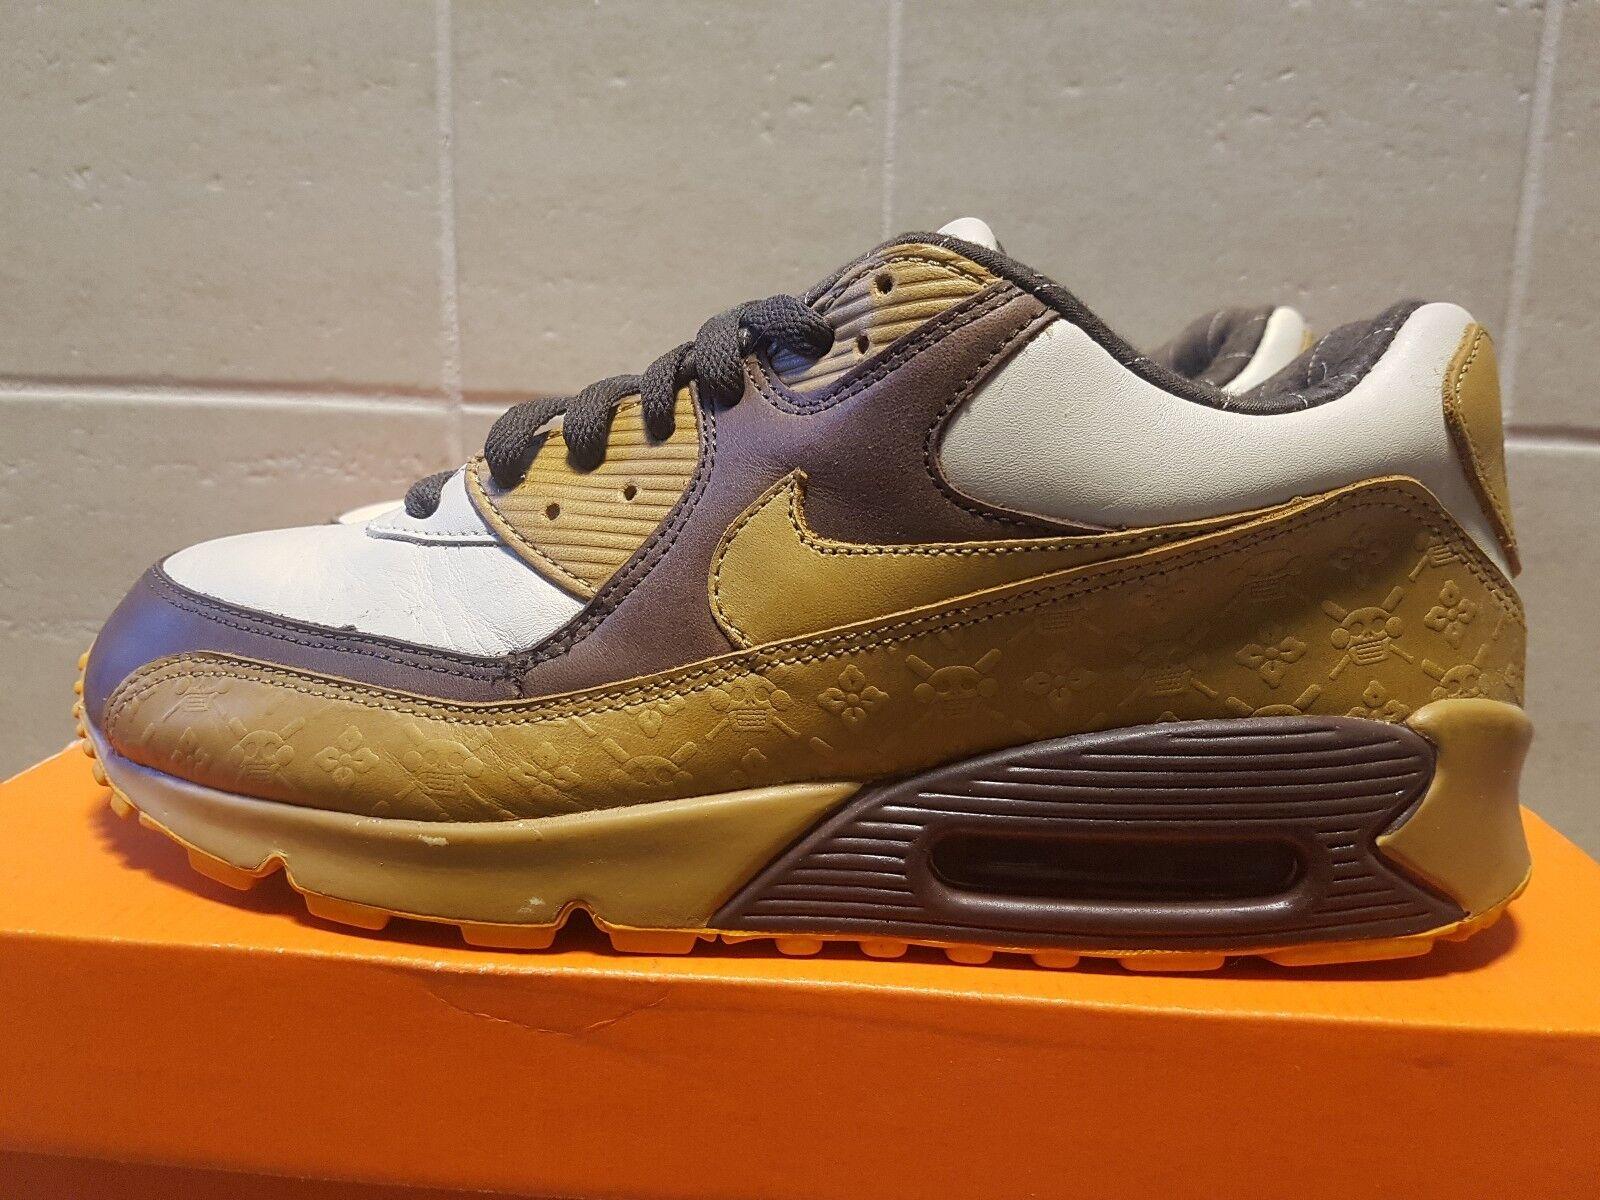 Nike air max 90 premio cioccolato grano teschi sz 313650-271